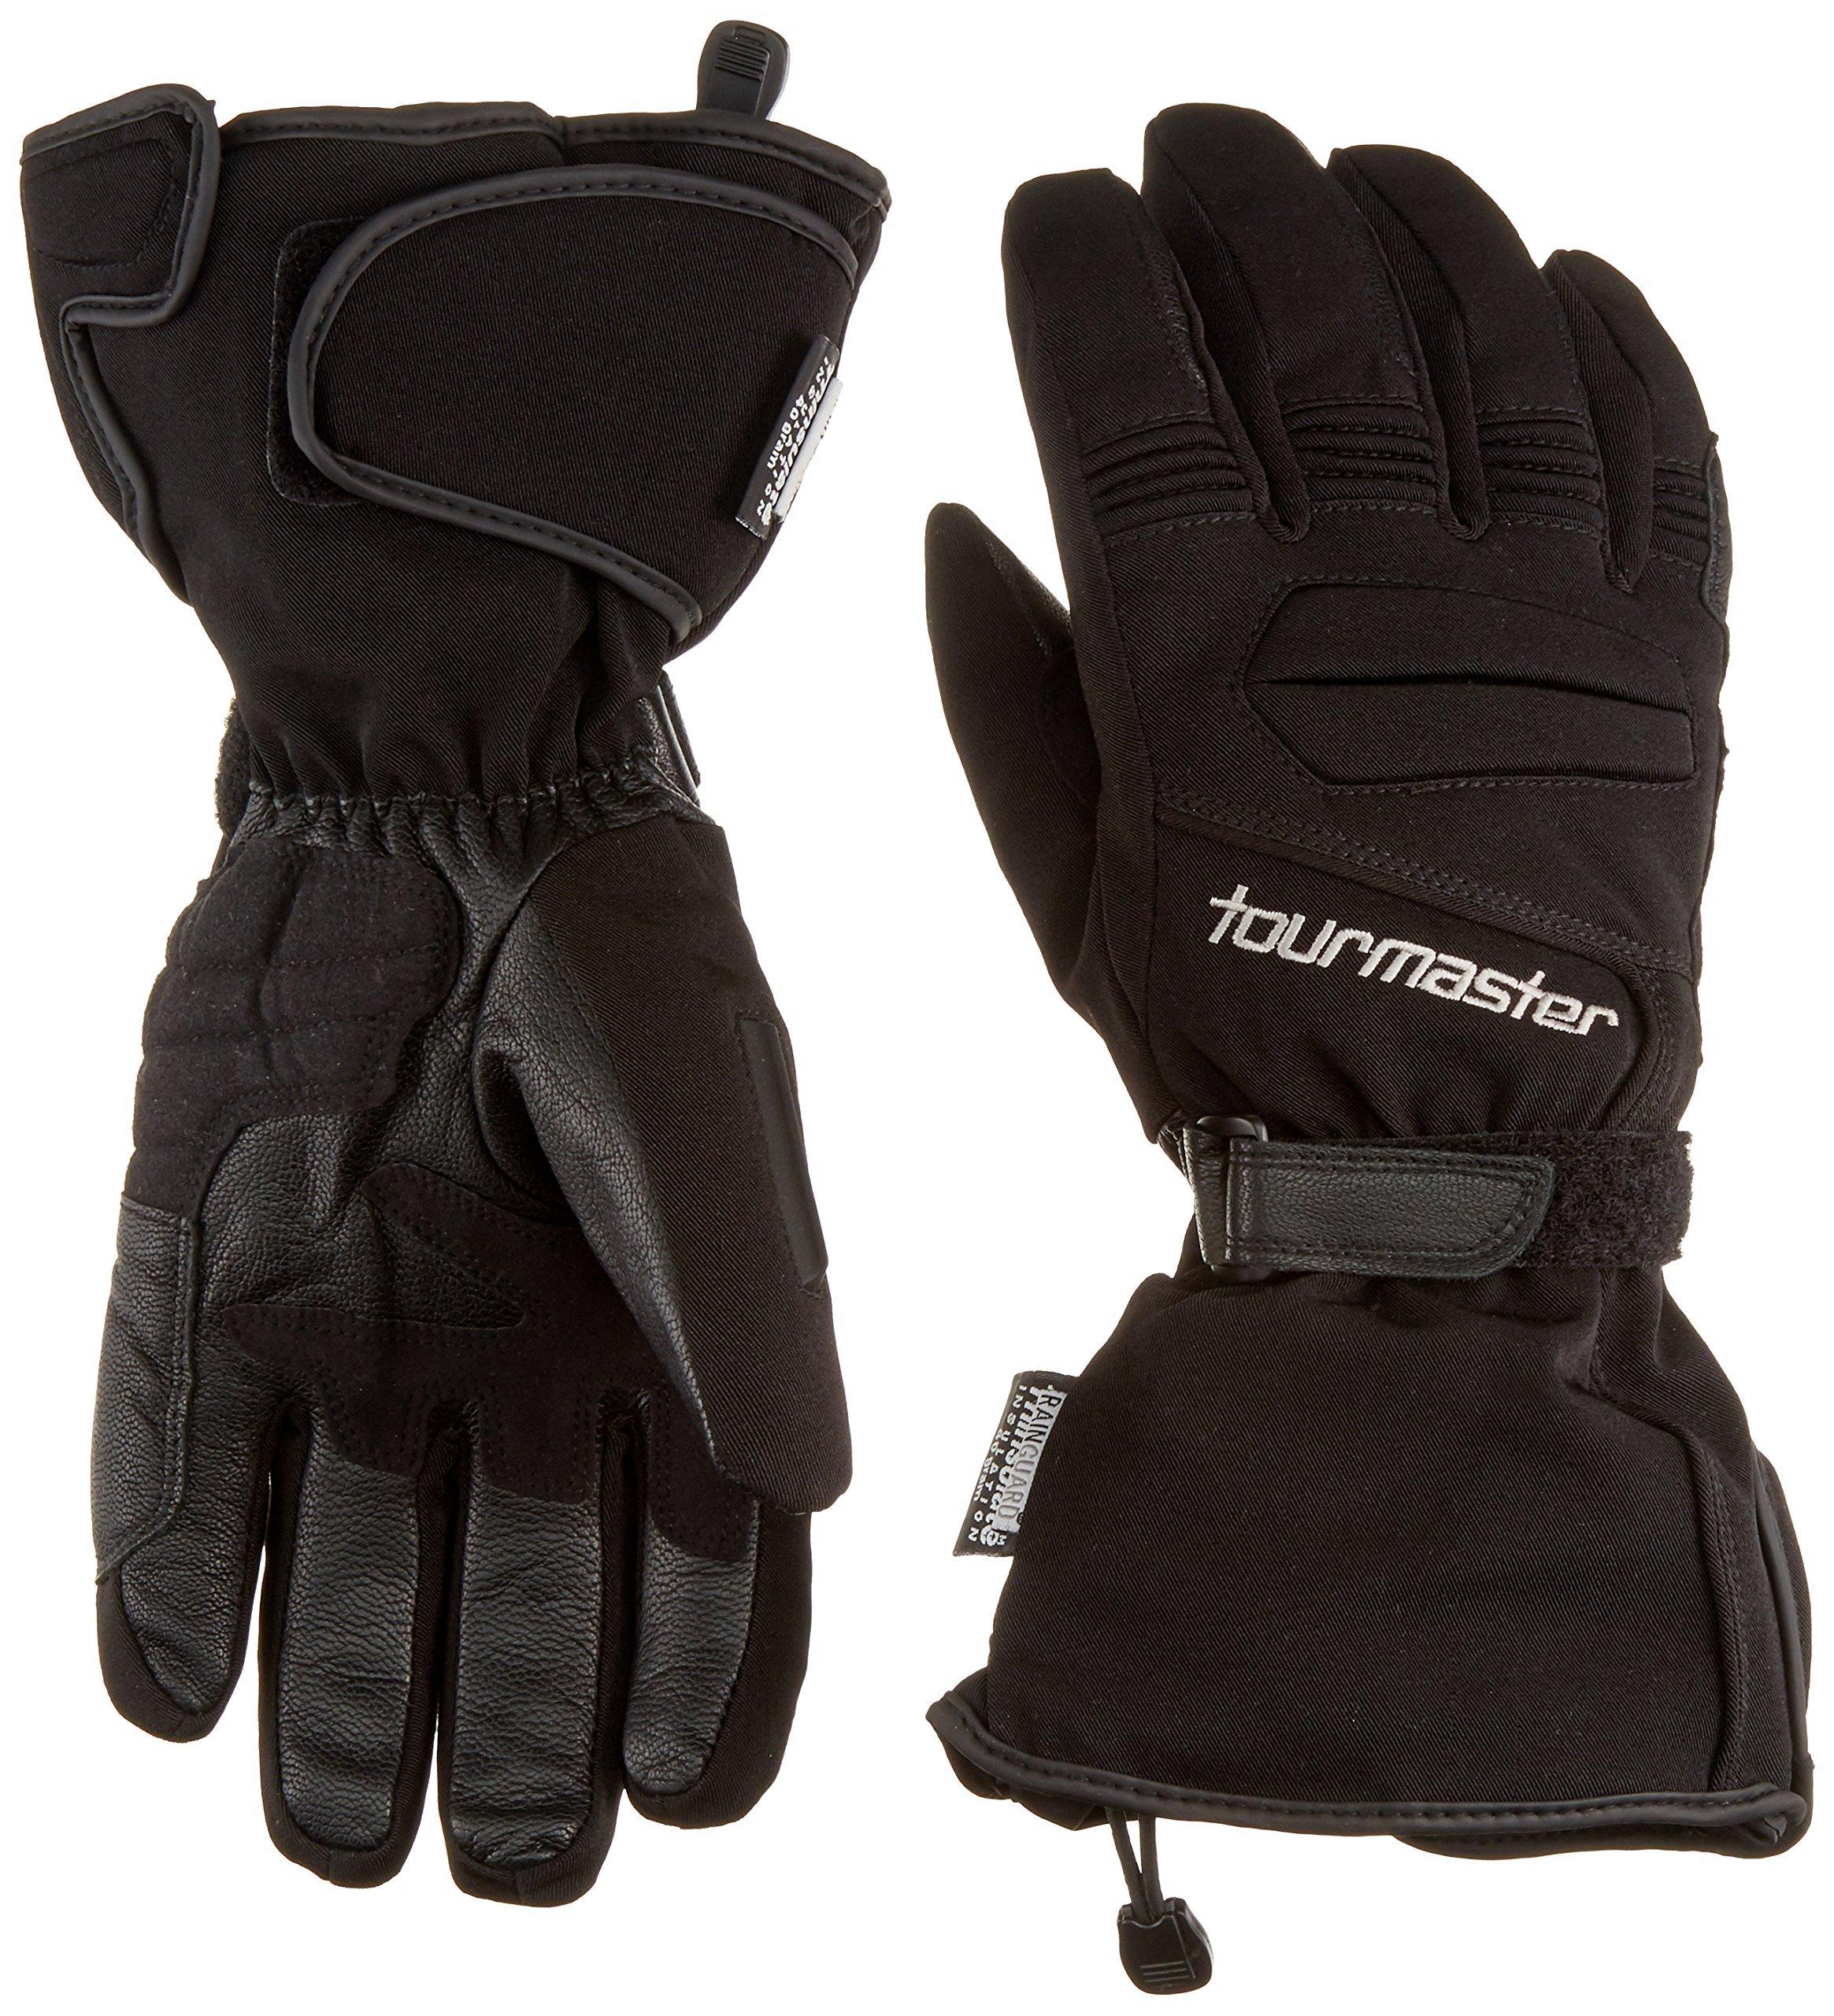 TourMaster Synergy 2.0 Electric Heated Textile Gloves (Medium, Black)